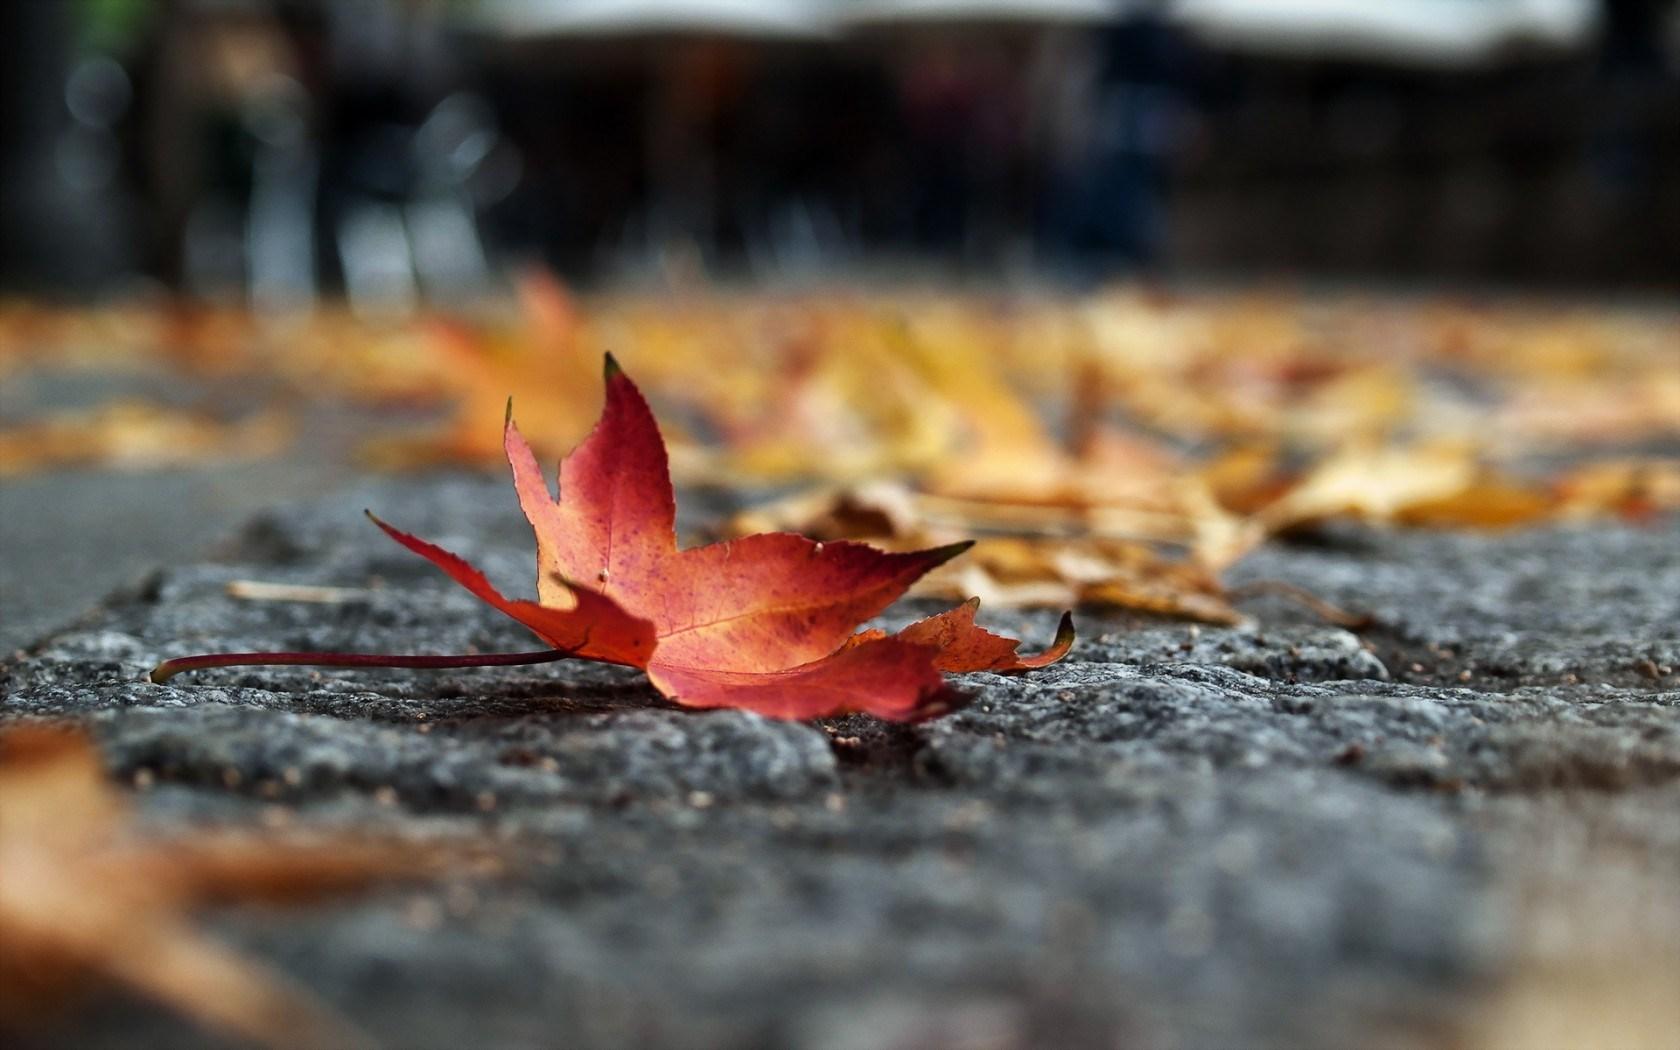 Autumn Leaves 3d Live Wallpaper Autumn Leaves Very Beautiful Hd Desktop Wallpapers 4k Hd